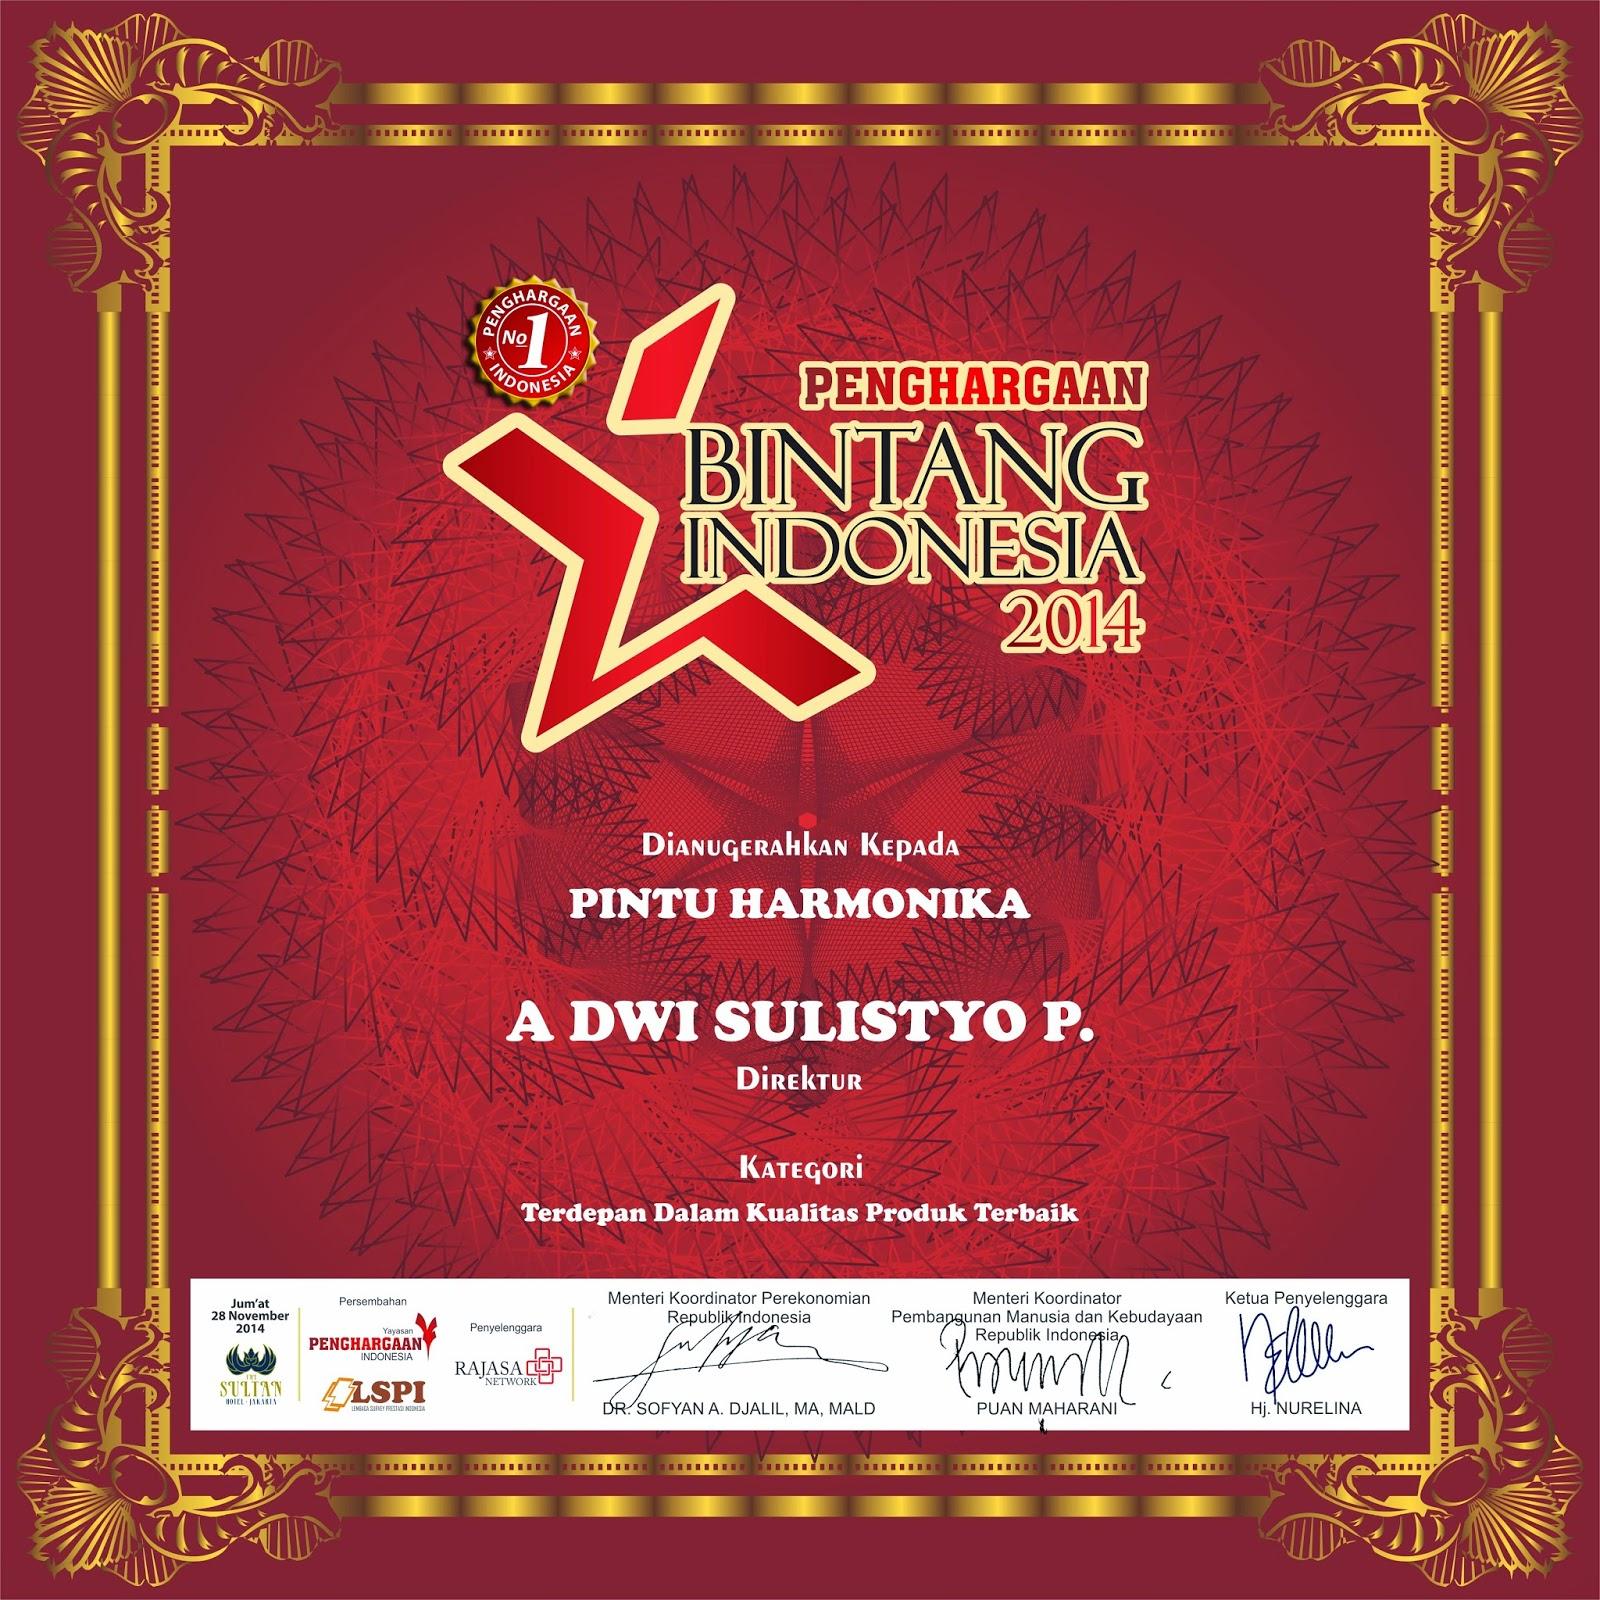 https://www.google.com/search?q=dwi+penghargaan+indonesia&ie=utf-8&oe=utf-8#q=dwi+sulistyo+penghargaan+indonesia